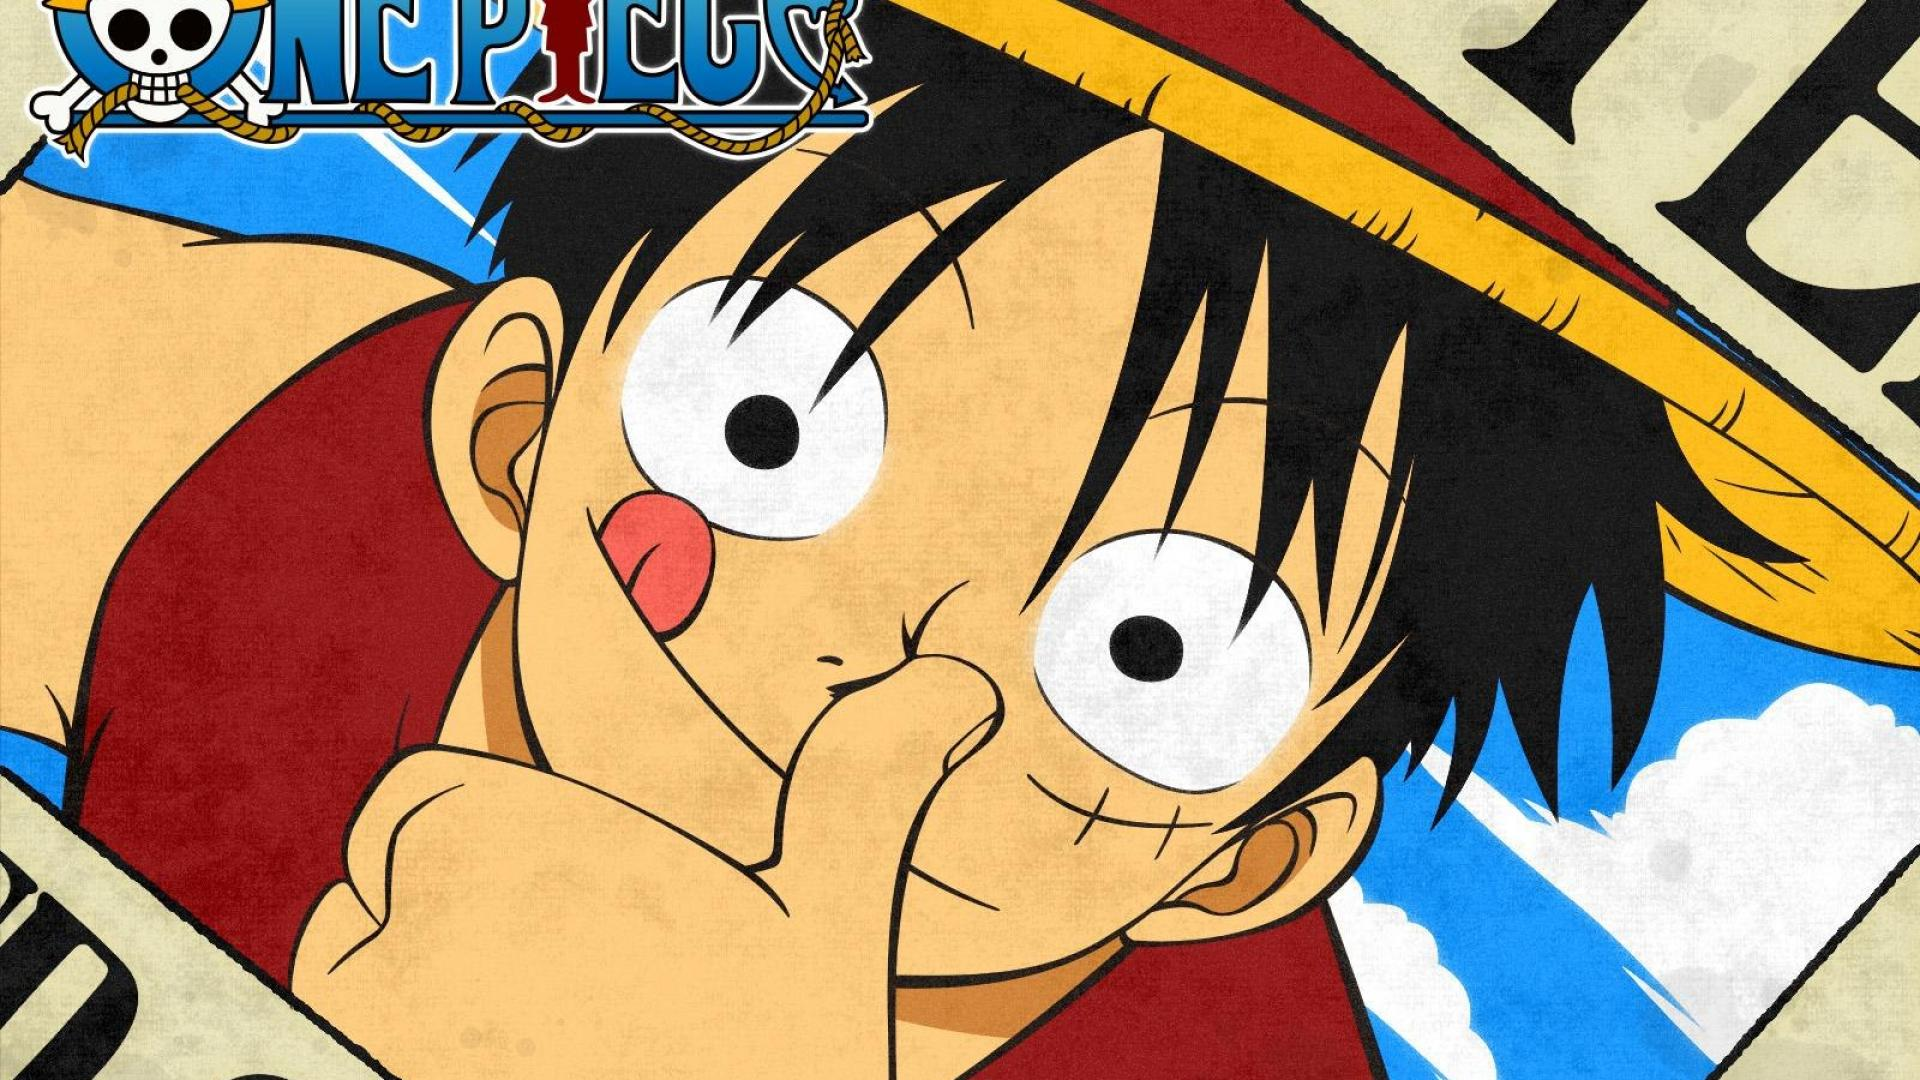 One Piece Luffy 41 Hd Wallpaper Animewp Com